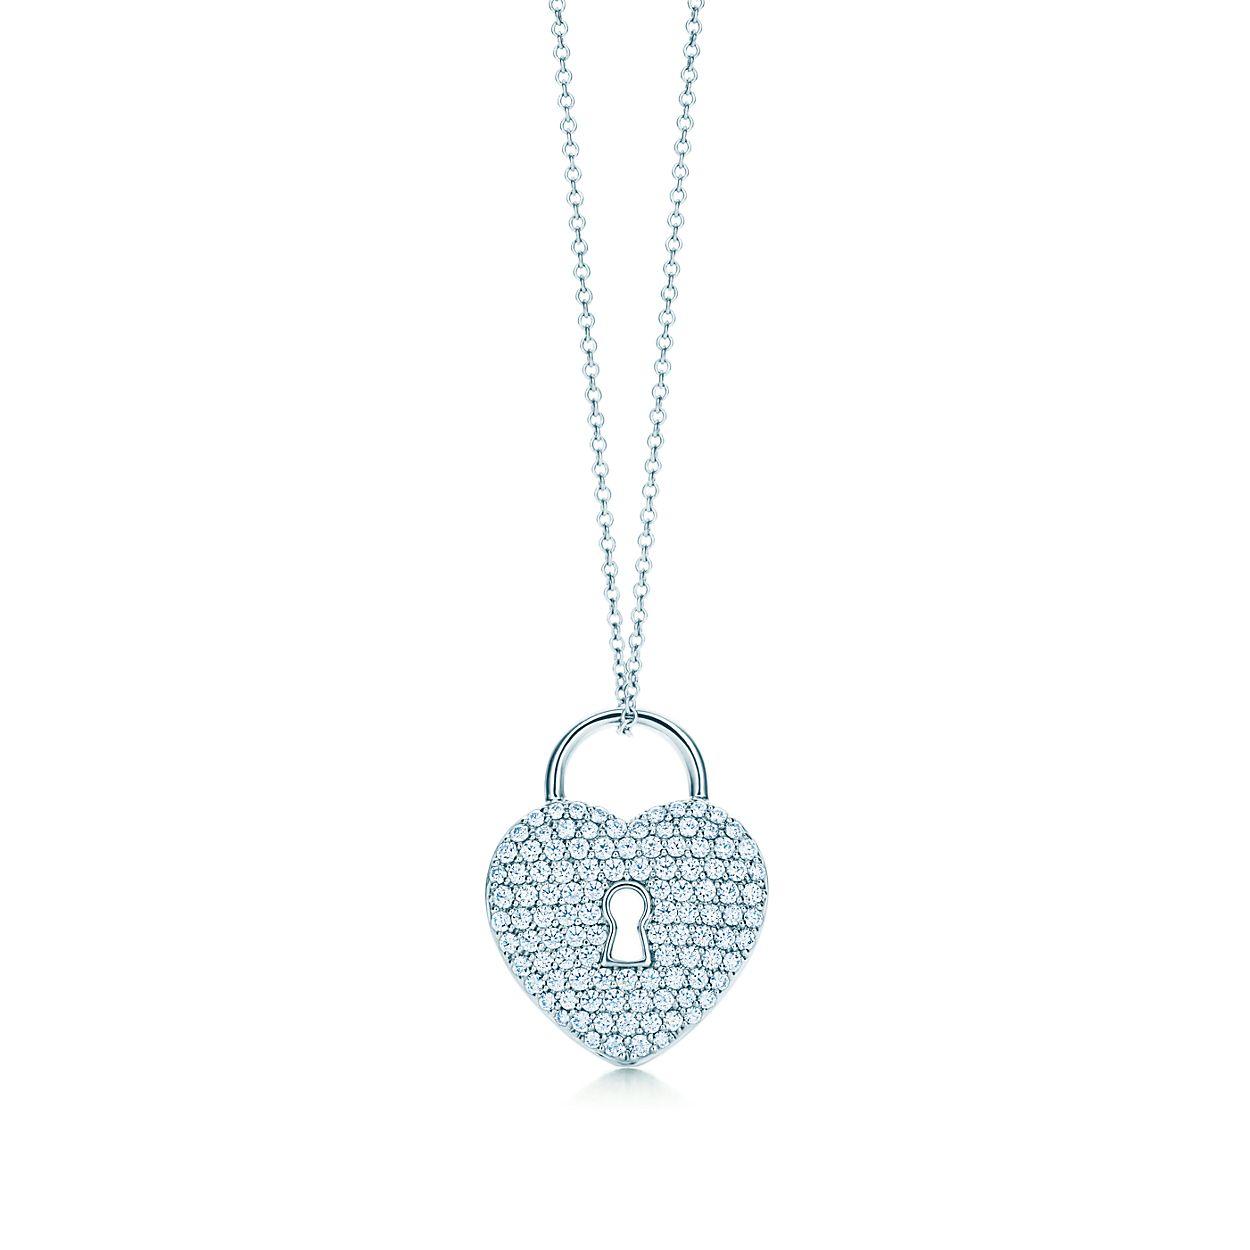 Tiffany locks heart lock pendant in platinum with diamonds on an 18 tiffany locksheart lock pendant tiffany locksheart lock pendant aloadofball Gallery